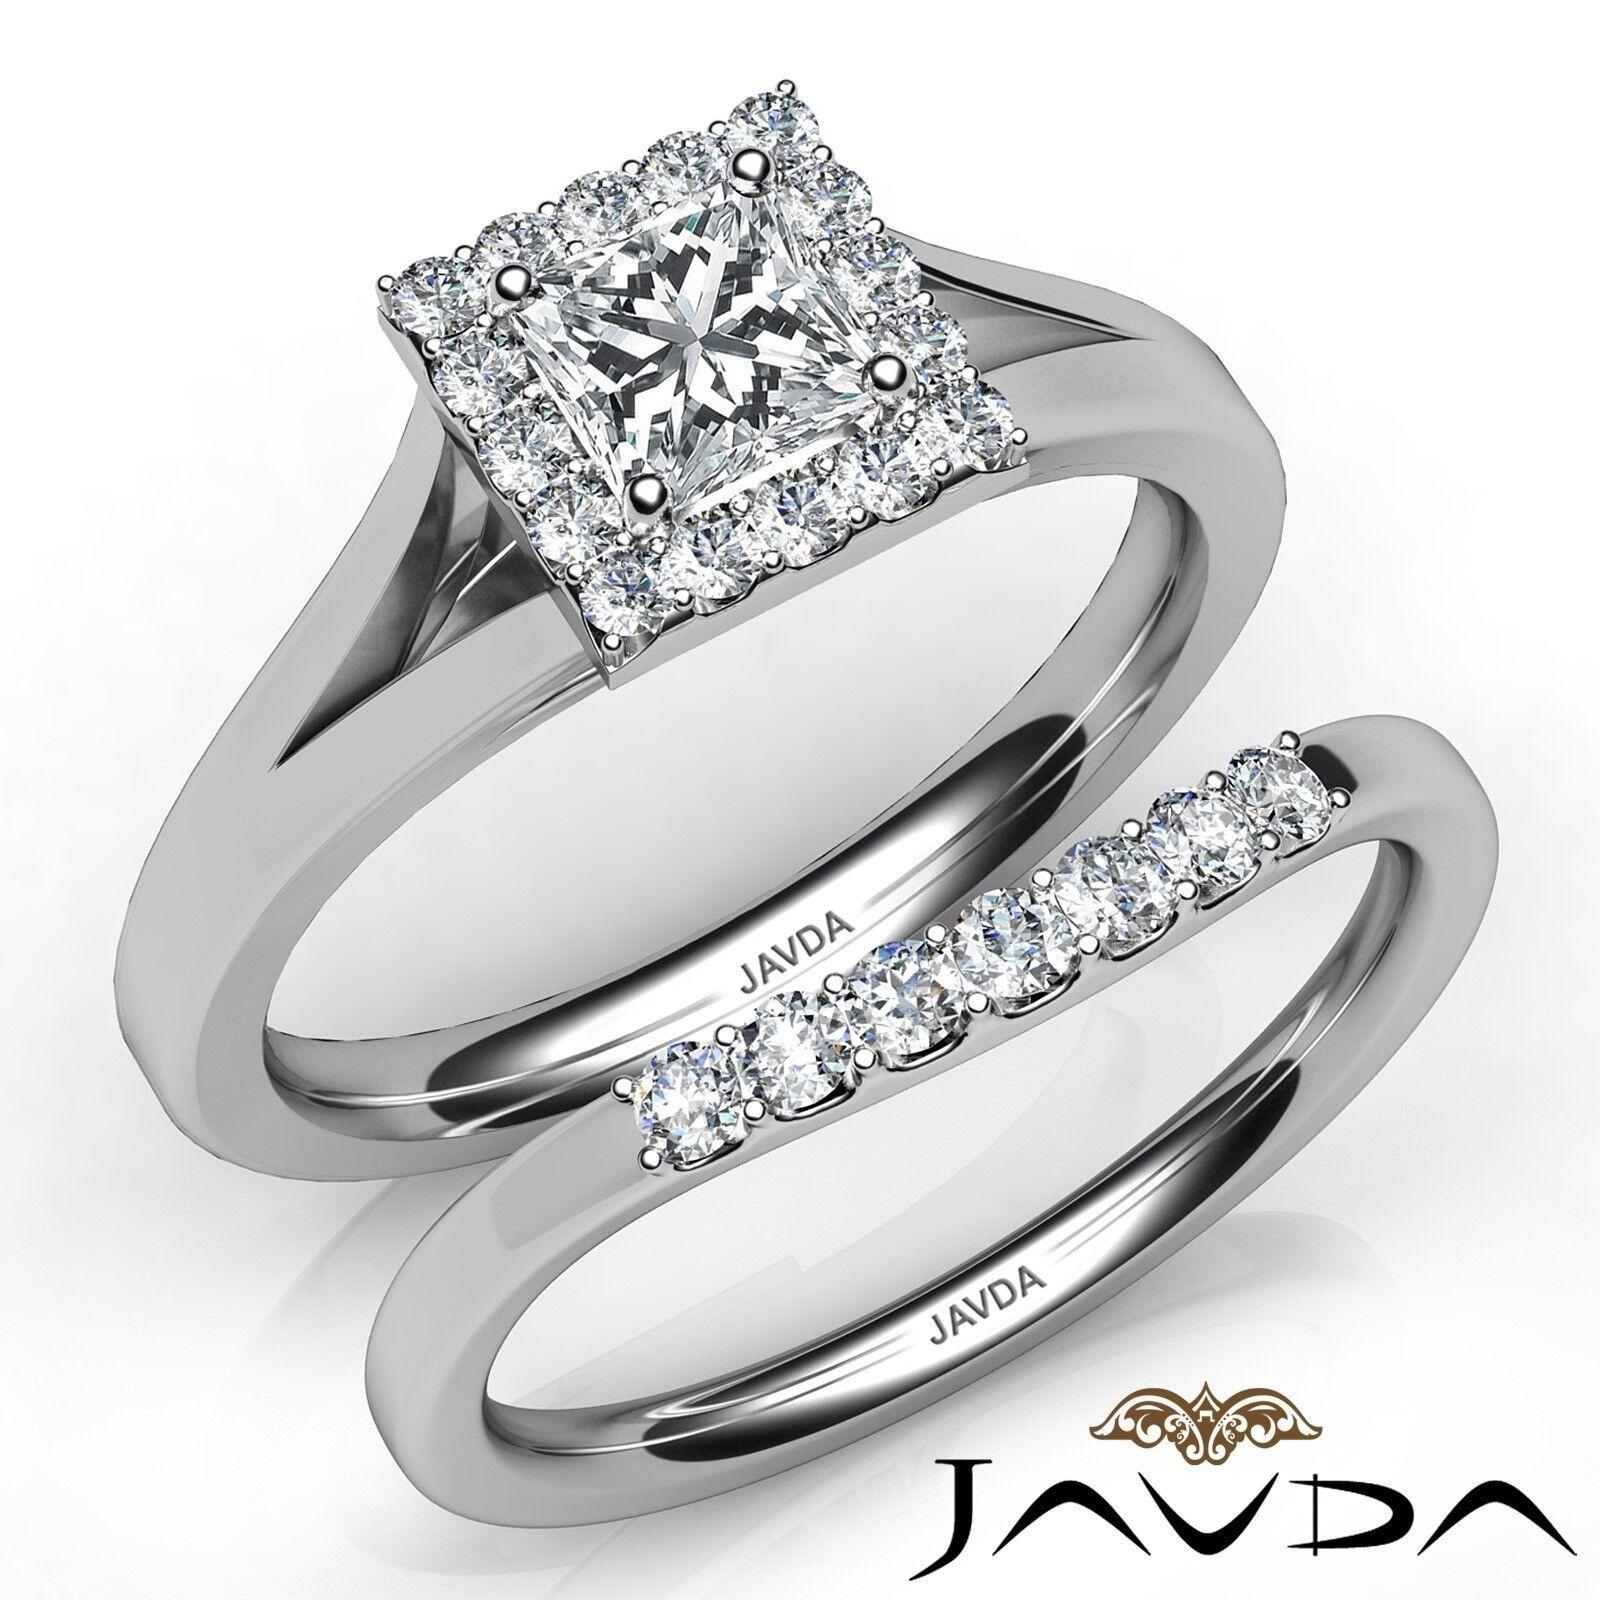 1.23ctw Halo Pave Bridal Princess Diamond Engagement Ring GIA F-VS2 White Gold